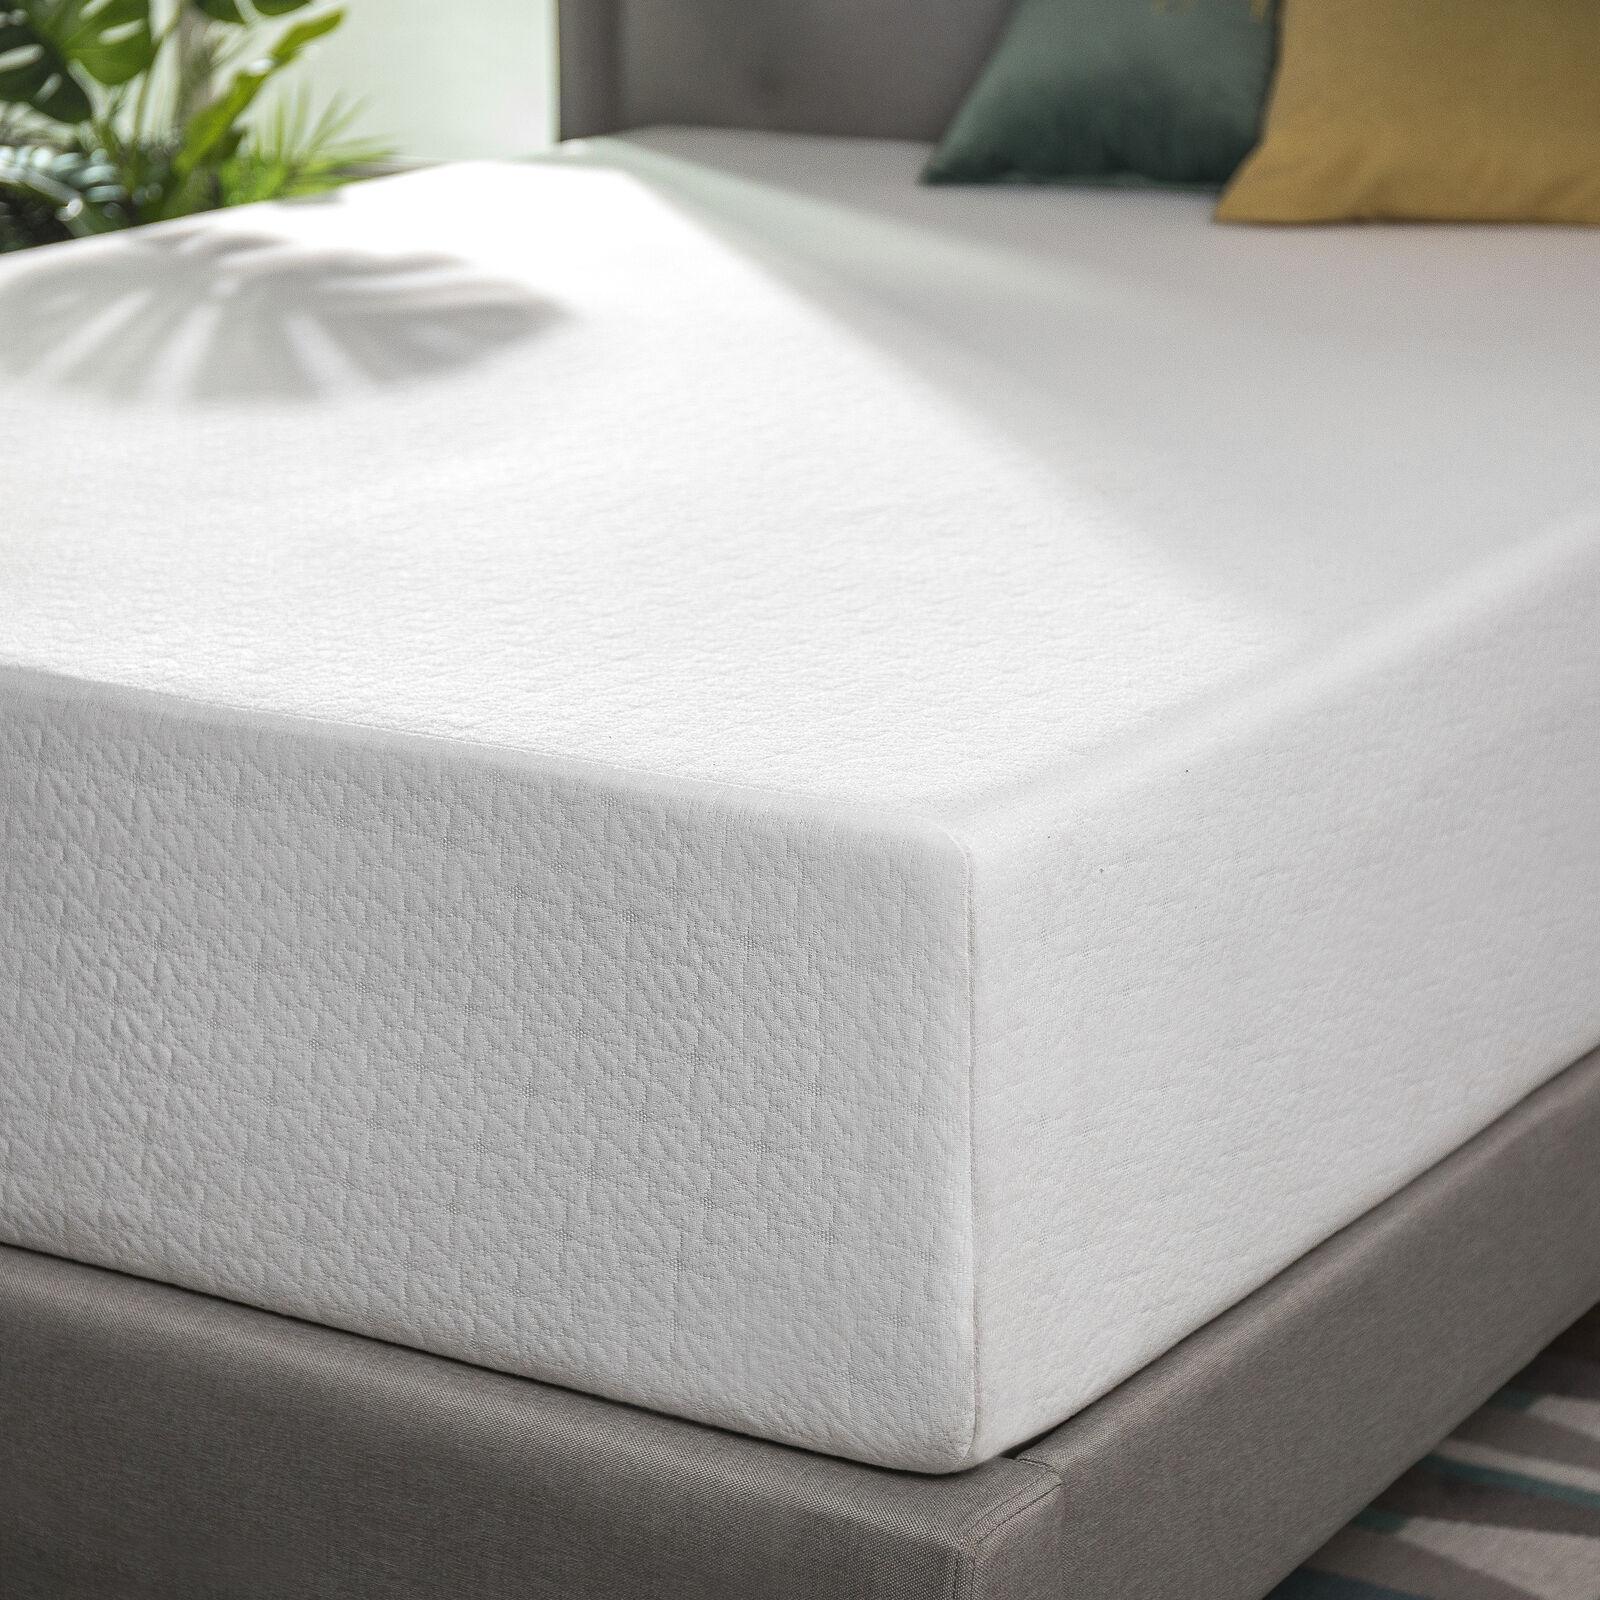 thumbnail 77 - Zinus Mattress Queen Double King Single Bed Memory Foam Pocket Spring Hybrid